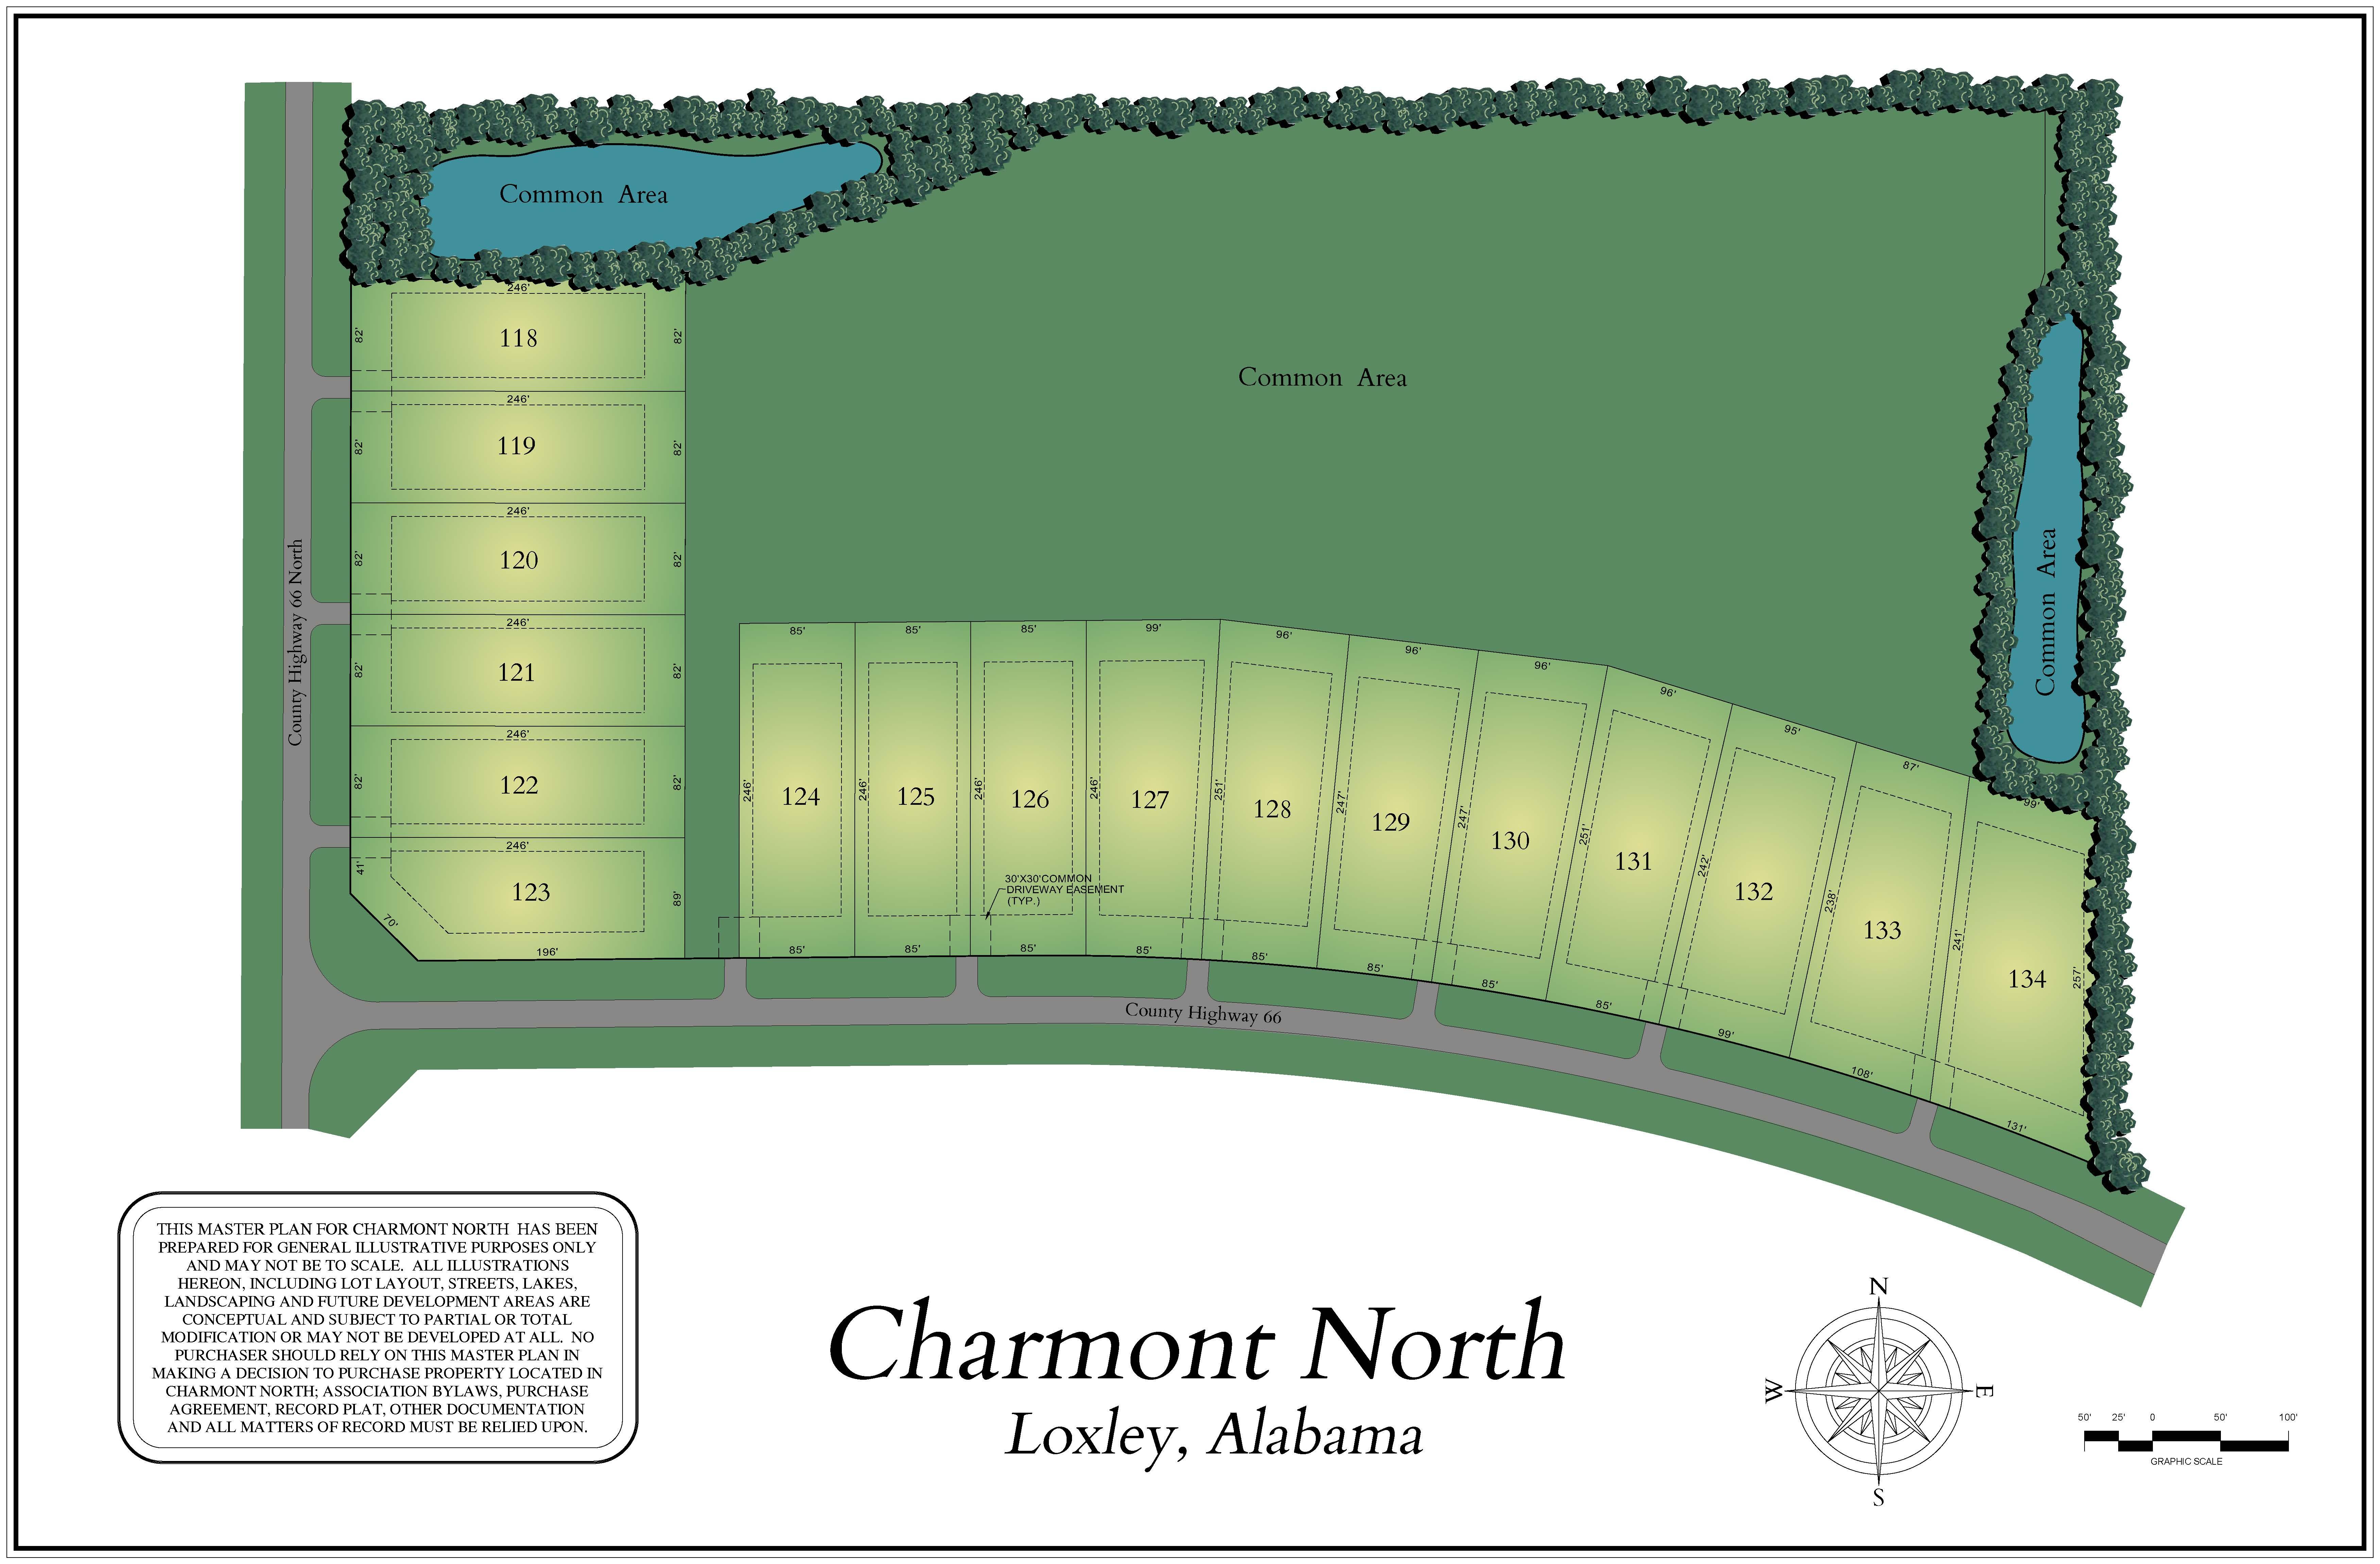 Charmont North Development